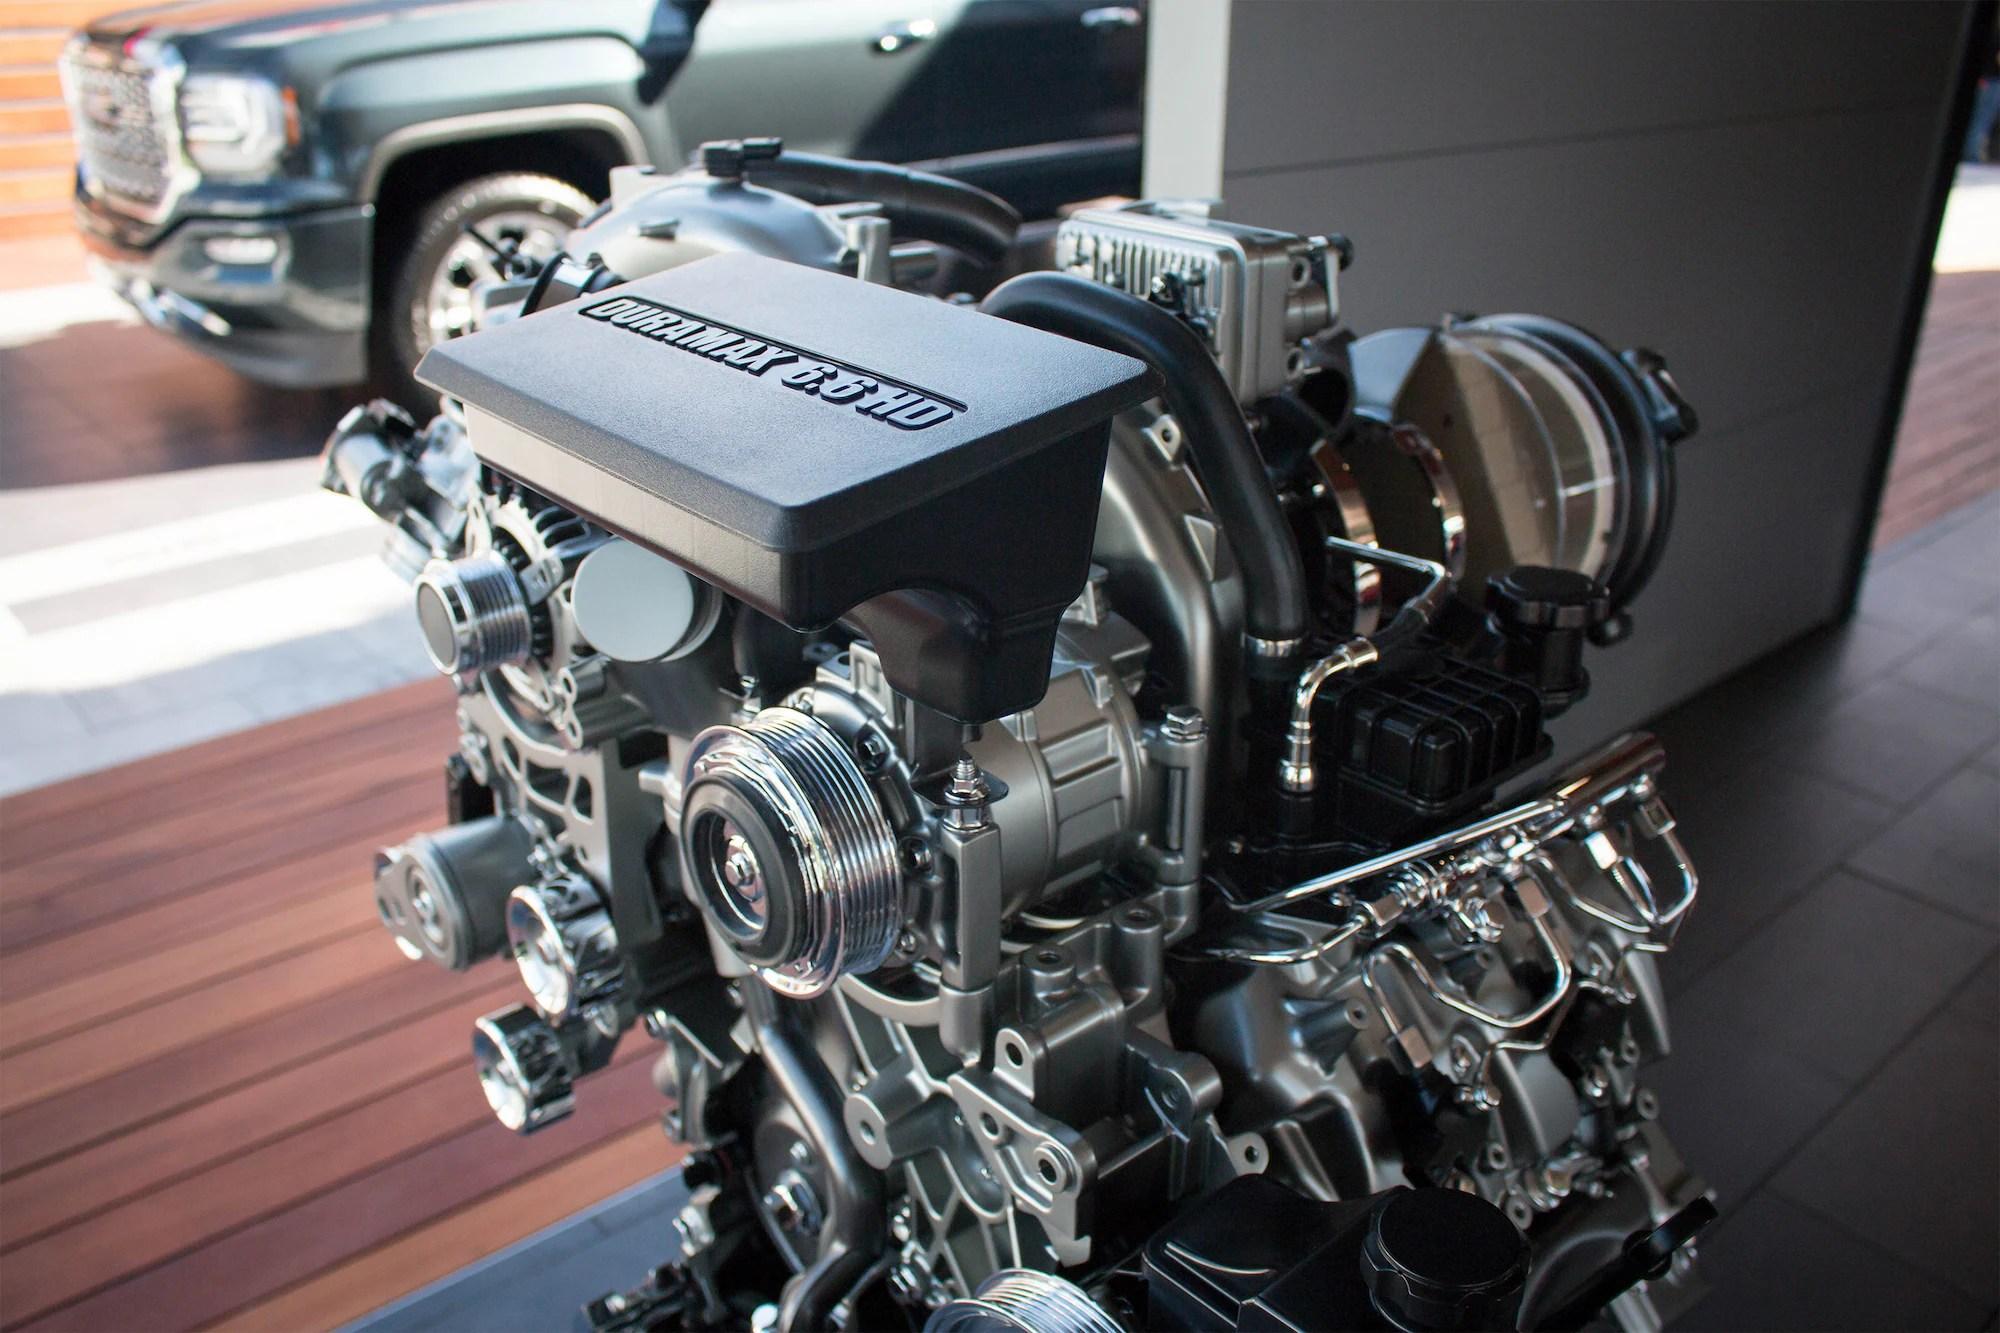 Duramax Diesel Engines Details Basics & Benefits - Gmc Life